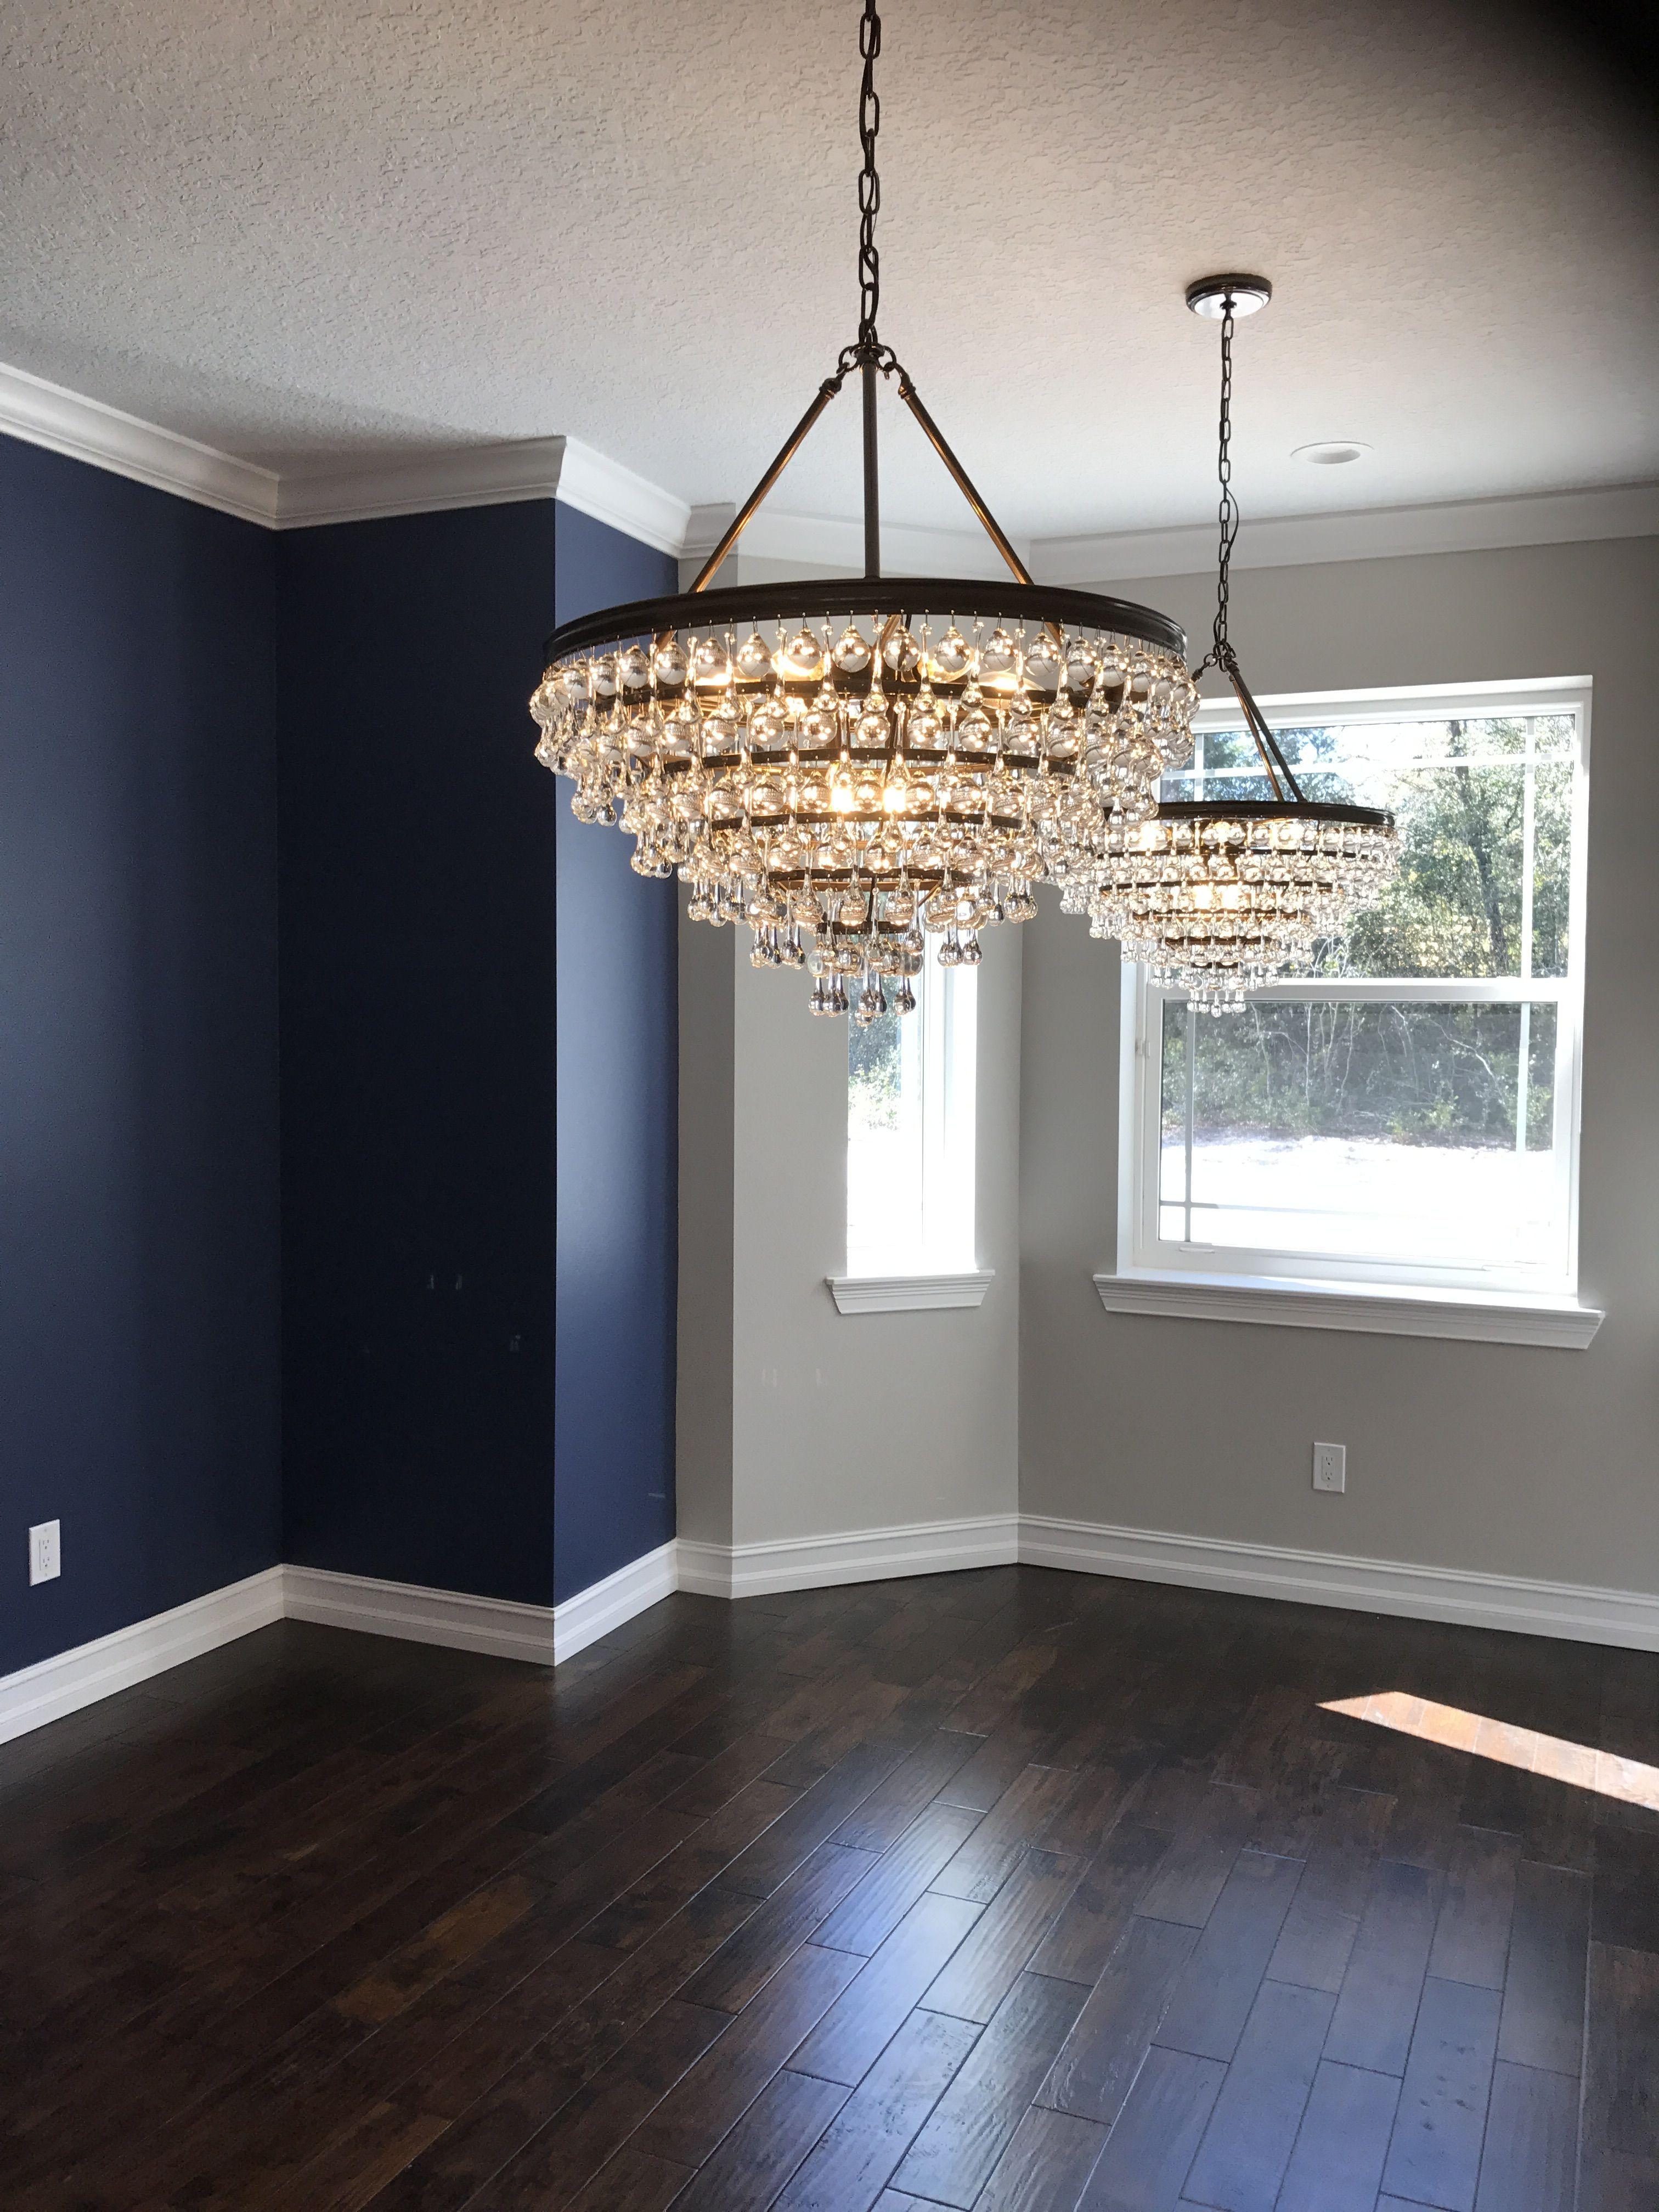 Dining Room Sw Indigo Batik Repose Grey Diningroomideas Accent Walls In Living Room Dining Room Accent Wall Bedroom Wall Colors #navy #walls #living #room